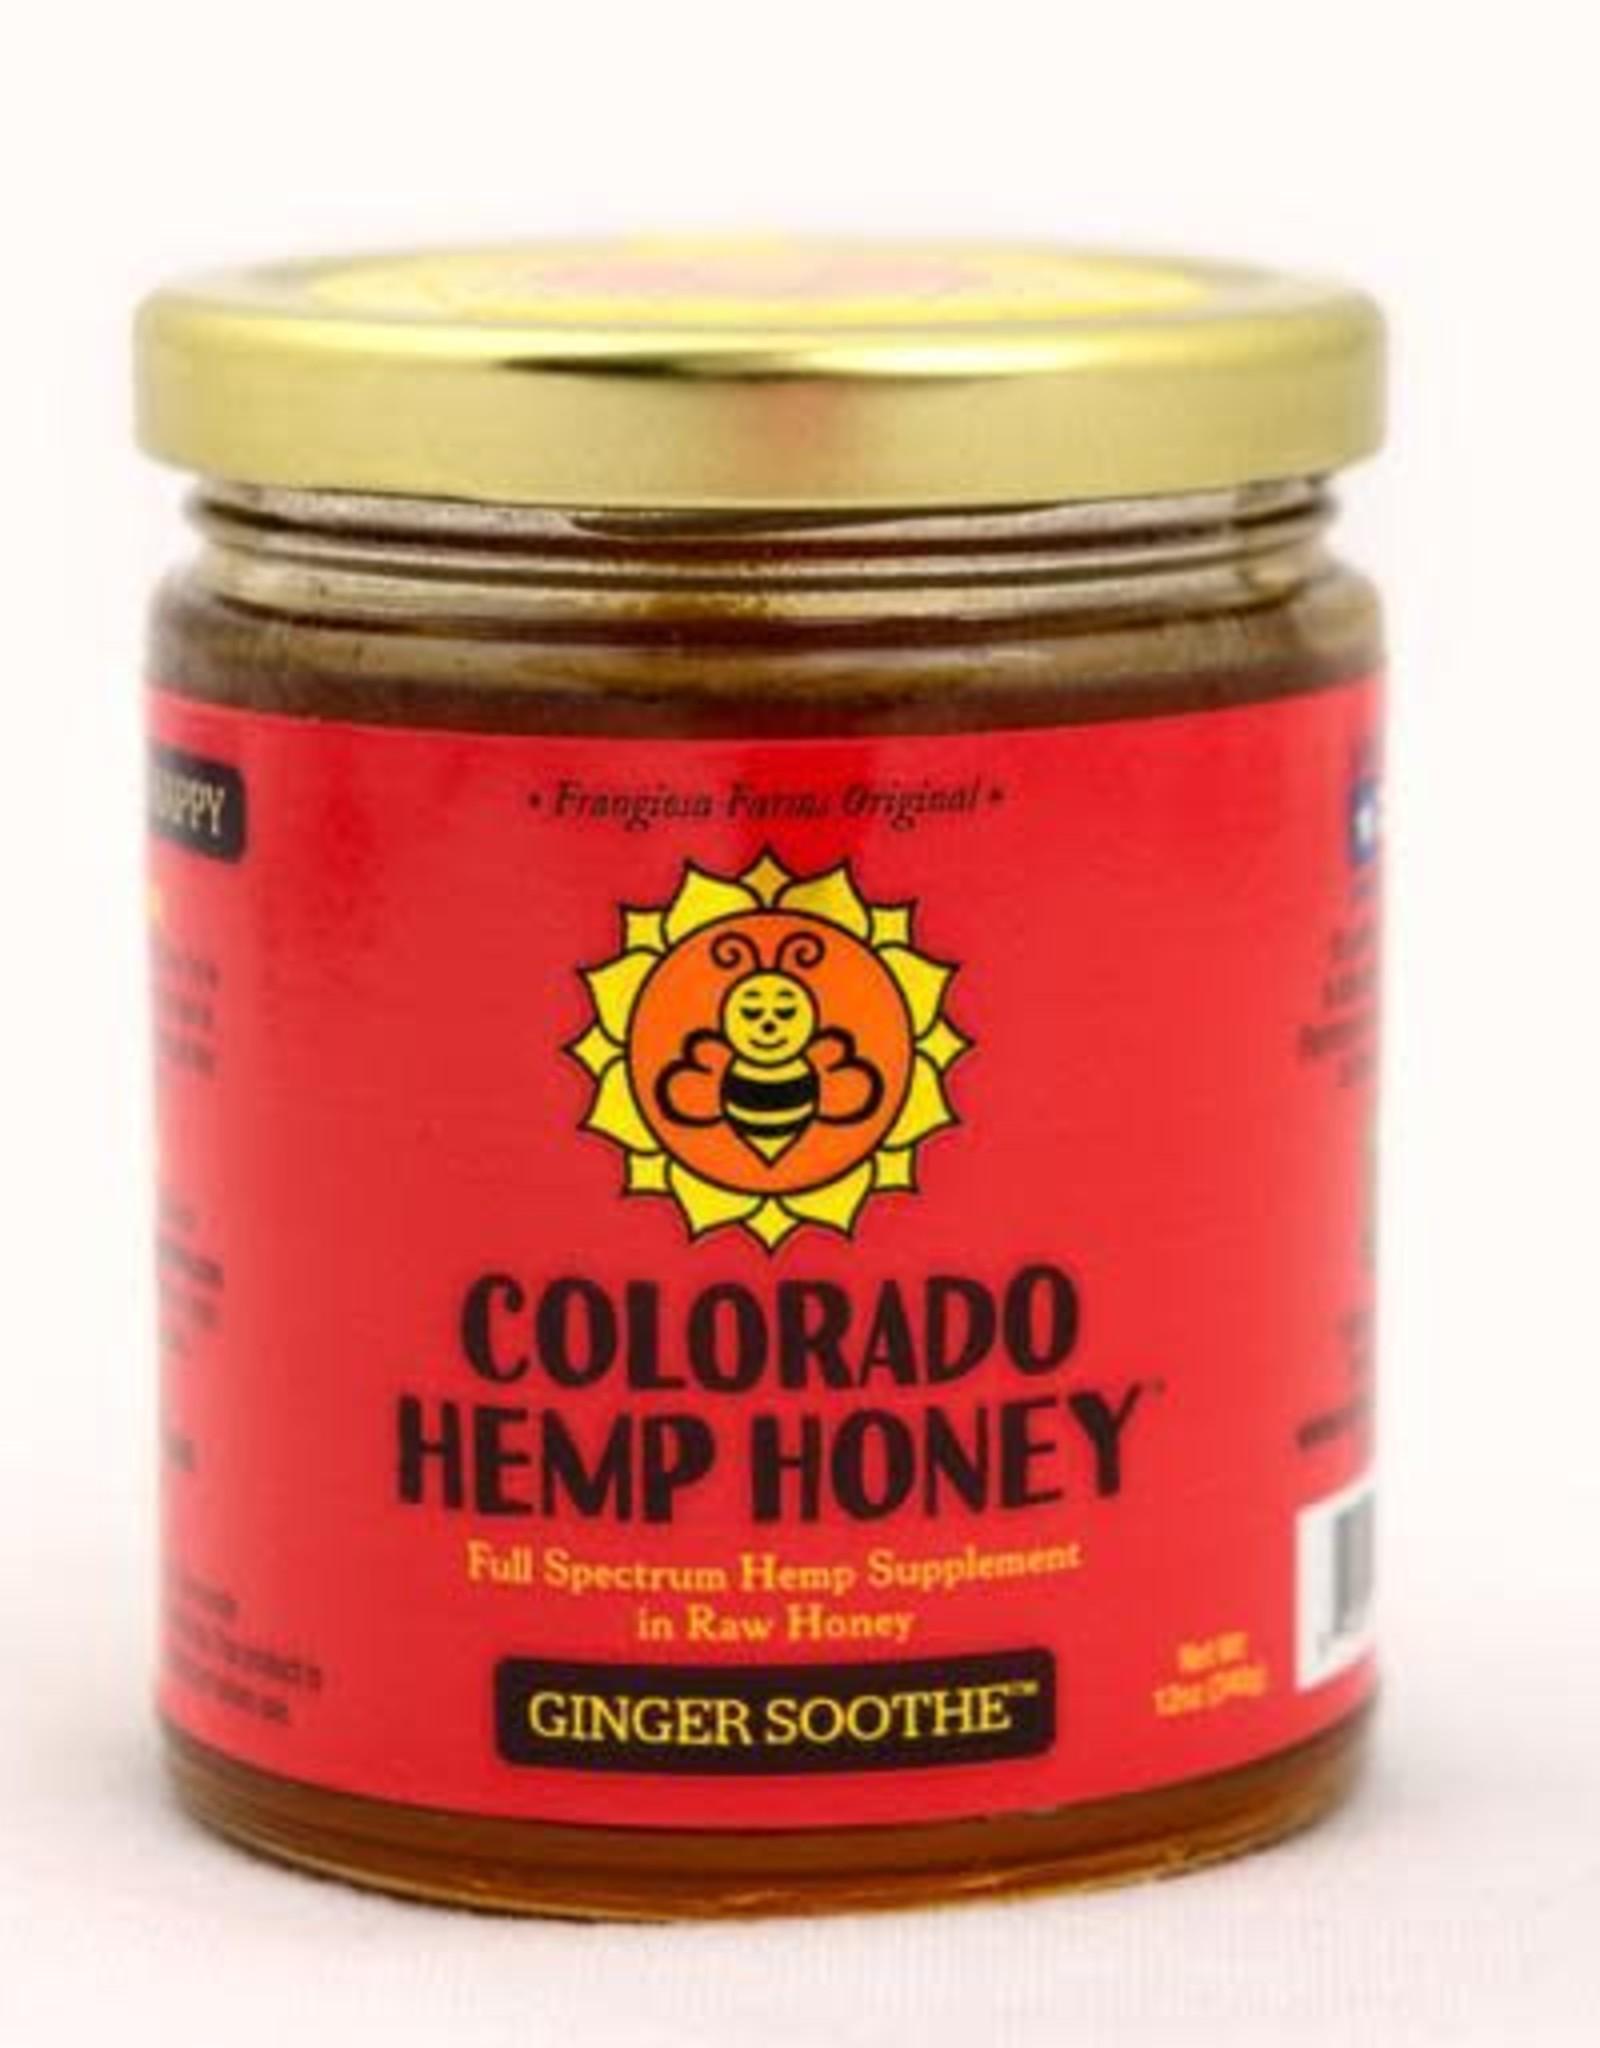 Colorado Hemp Honey Colorado Hemp Honey Ginger Soothe 6oz Jar